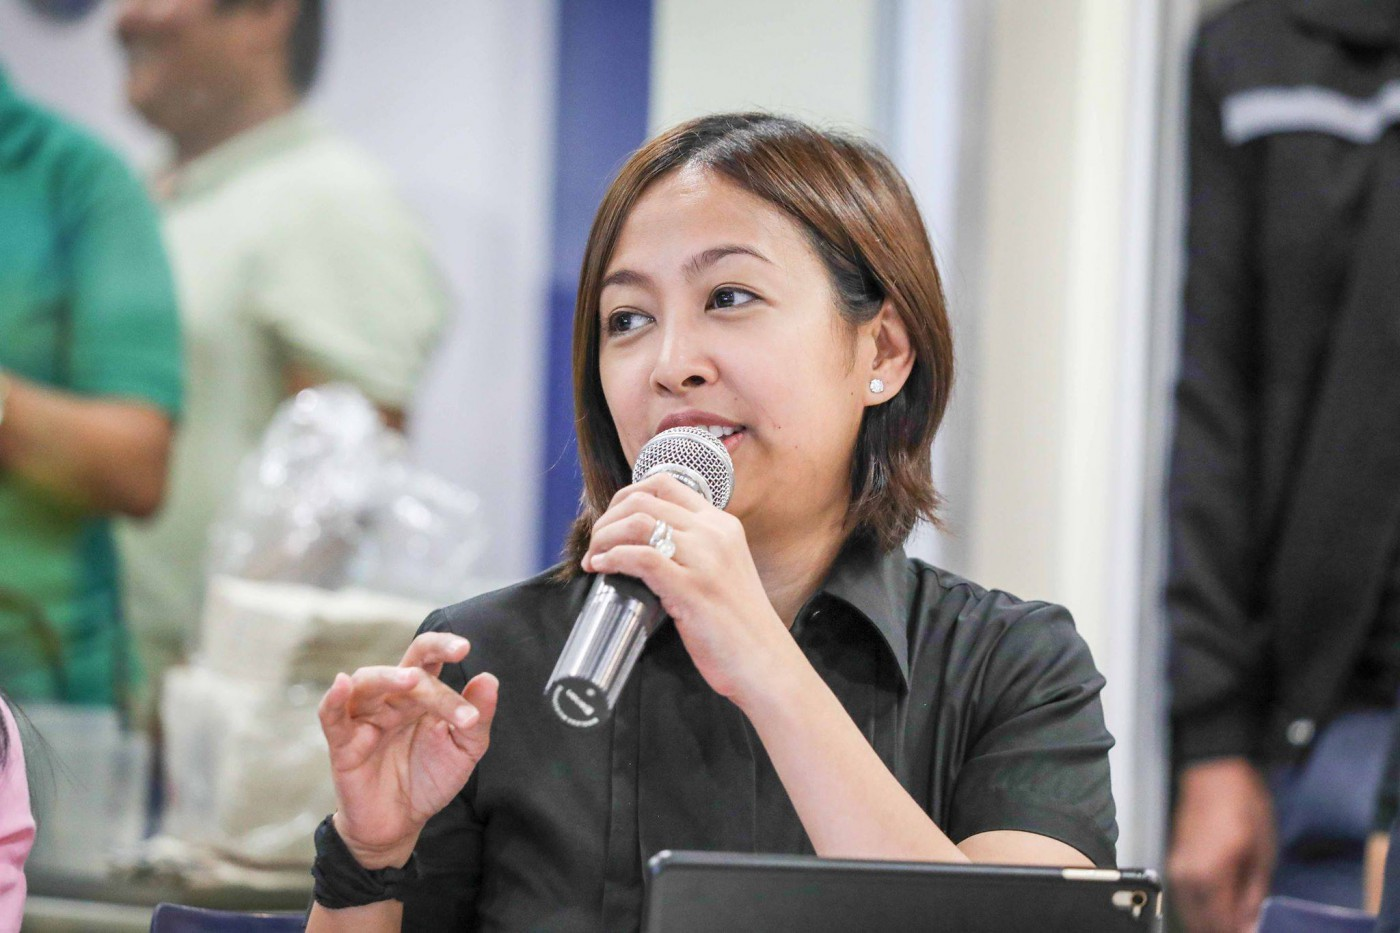 Makati City Mayor Abigail %u201CAbby%u201D Binay